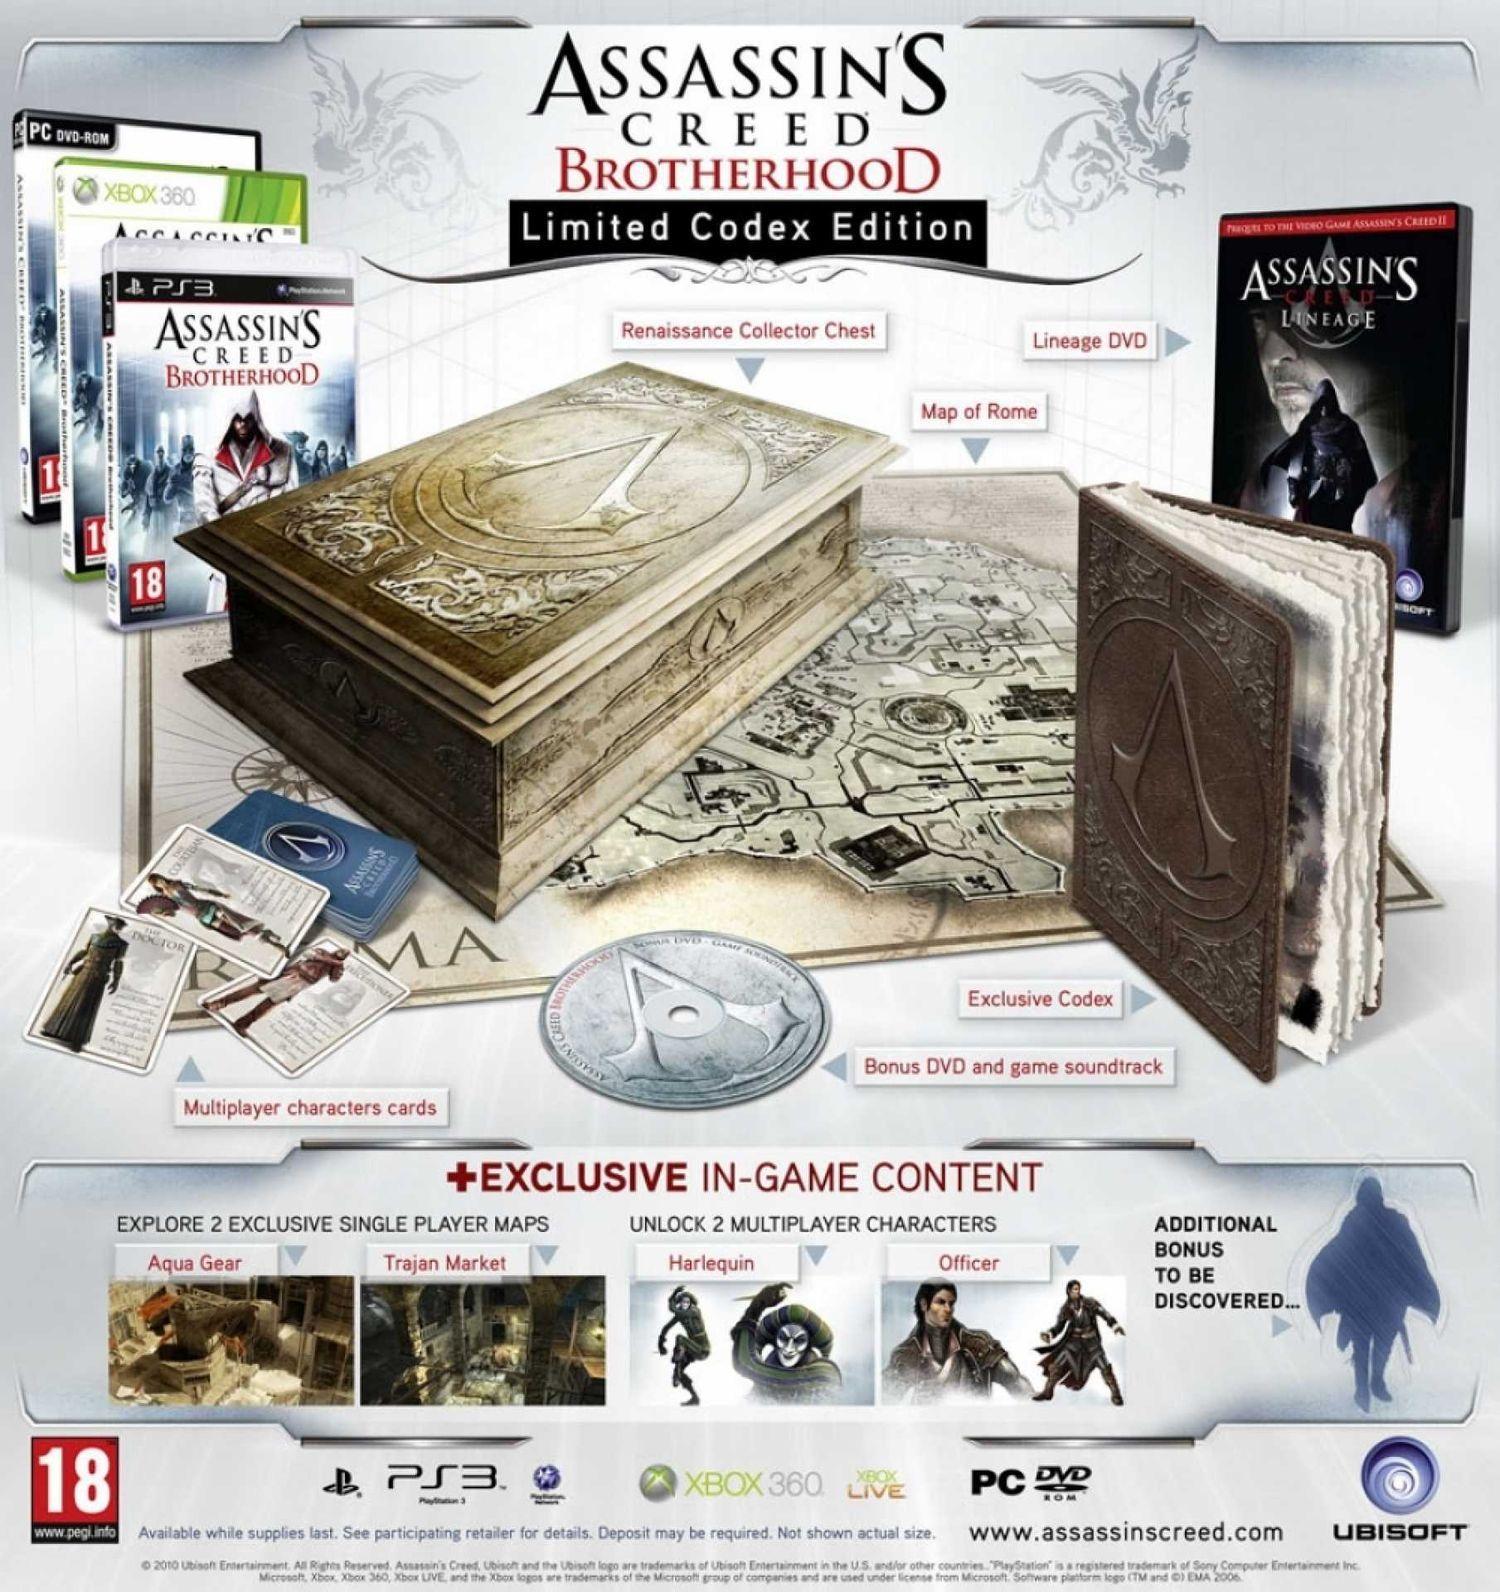 Assassin S Creed Brotherhood Limited Codex Edition Assassin S